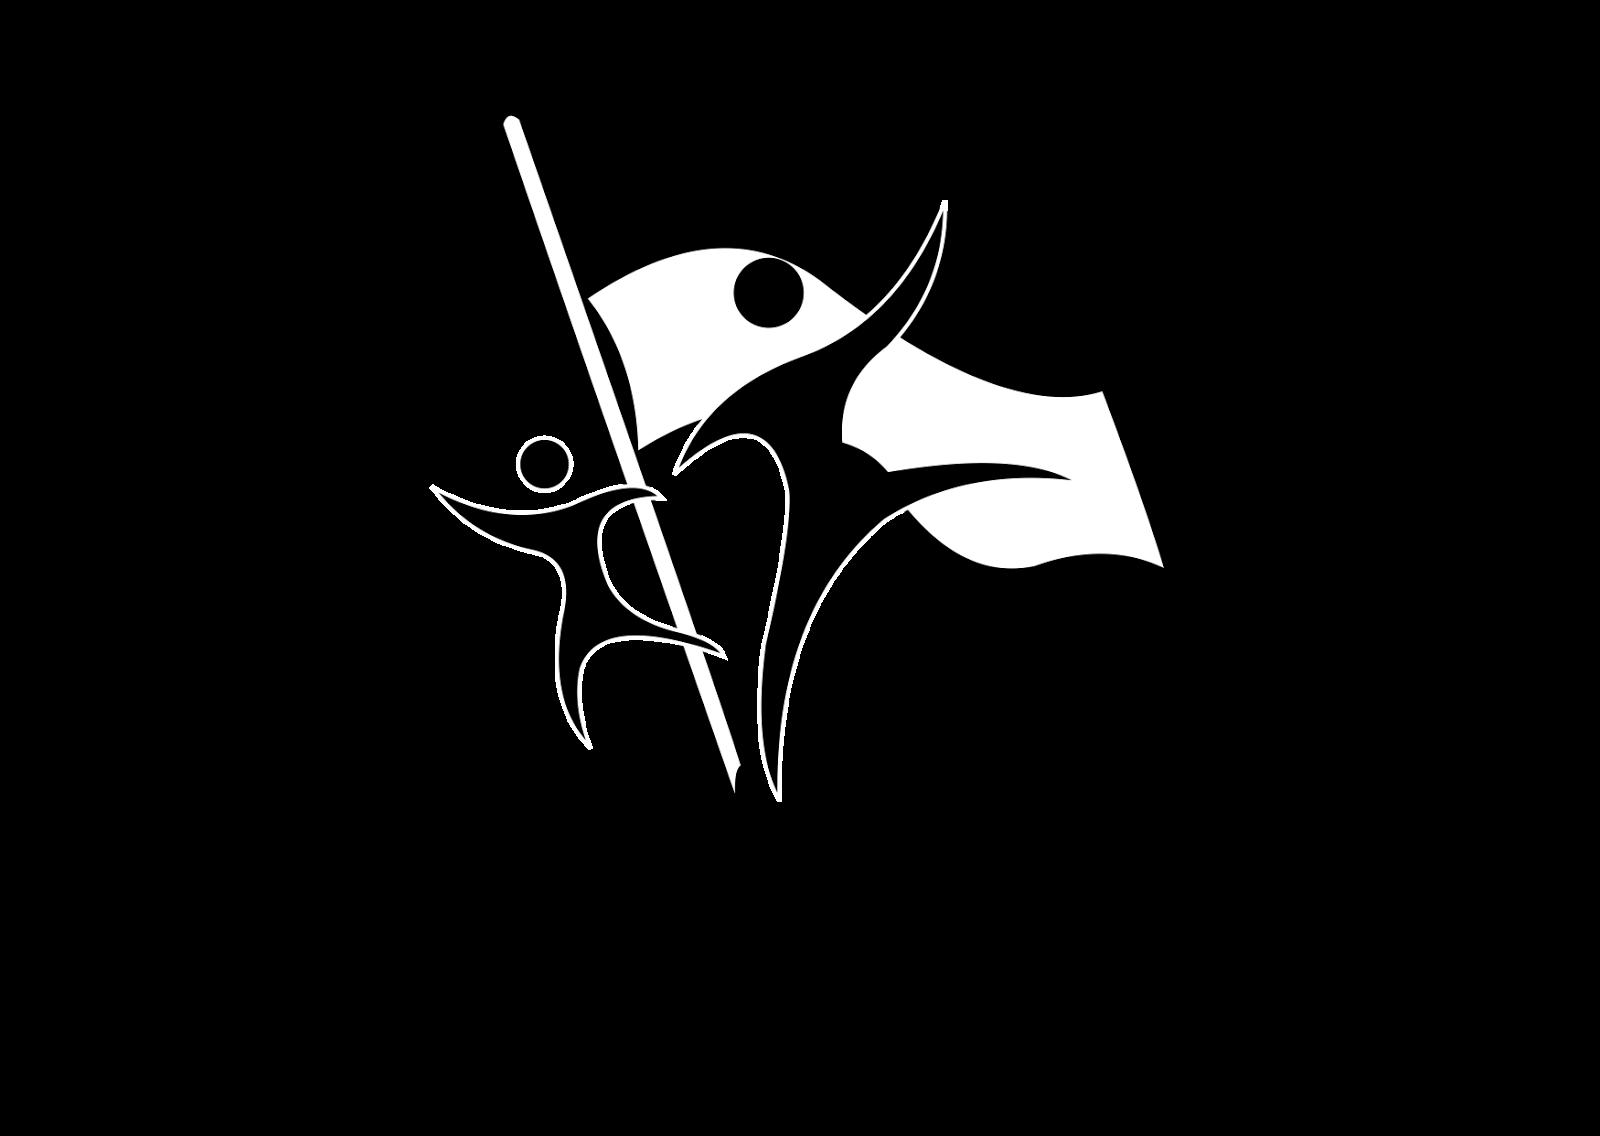 audi logo vector. himpaudi logo vector 1 warna black white mode audi